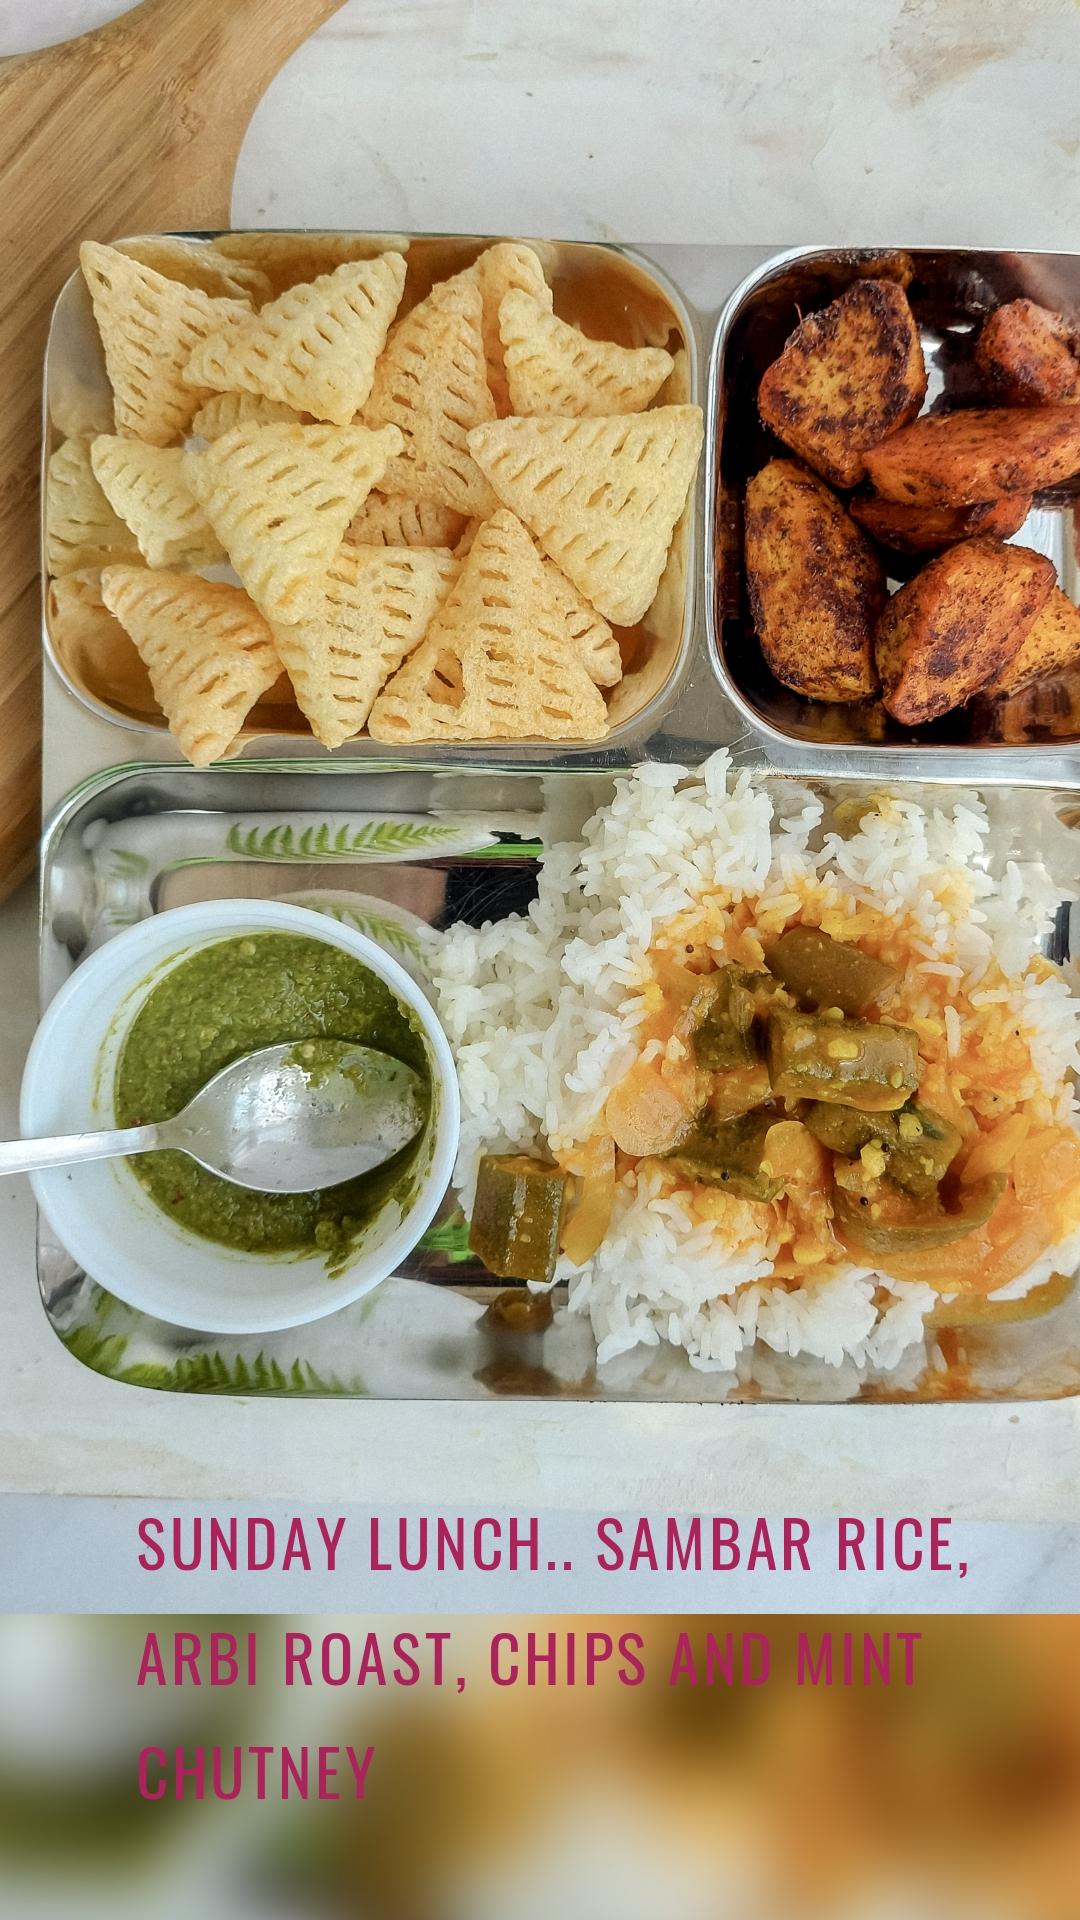 Sunday lunch.. sambar rice, arbi Roast, chips and mint chutney